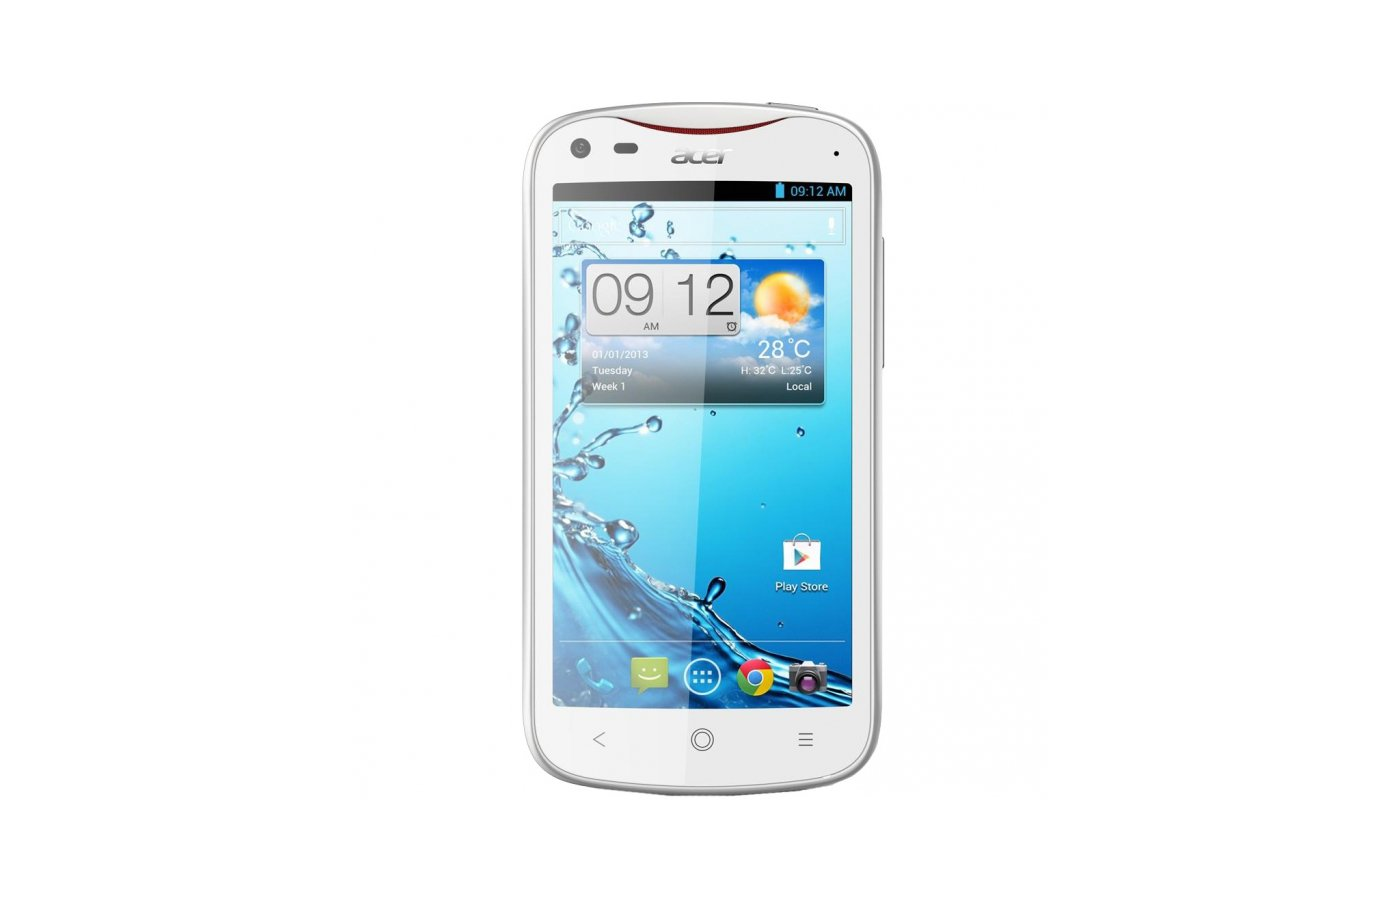 Смартфон digma z520 3g citi 8gb белый моноблок 3g 2sim 5 720x1280 android 51 8mpix wifi bt gps gsm